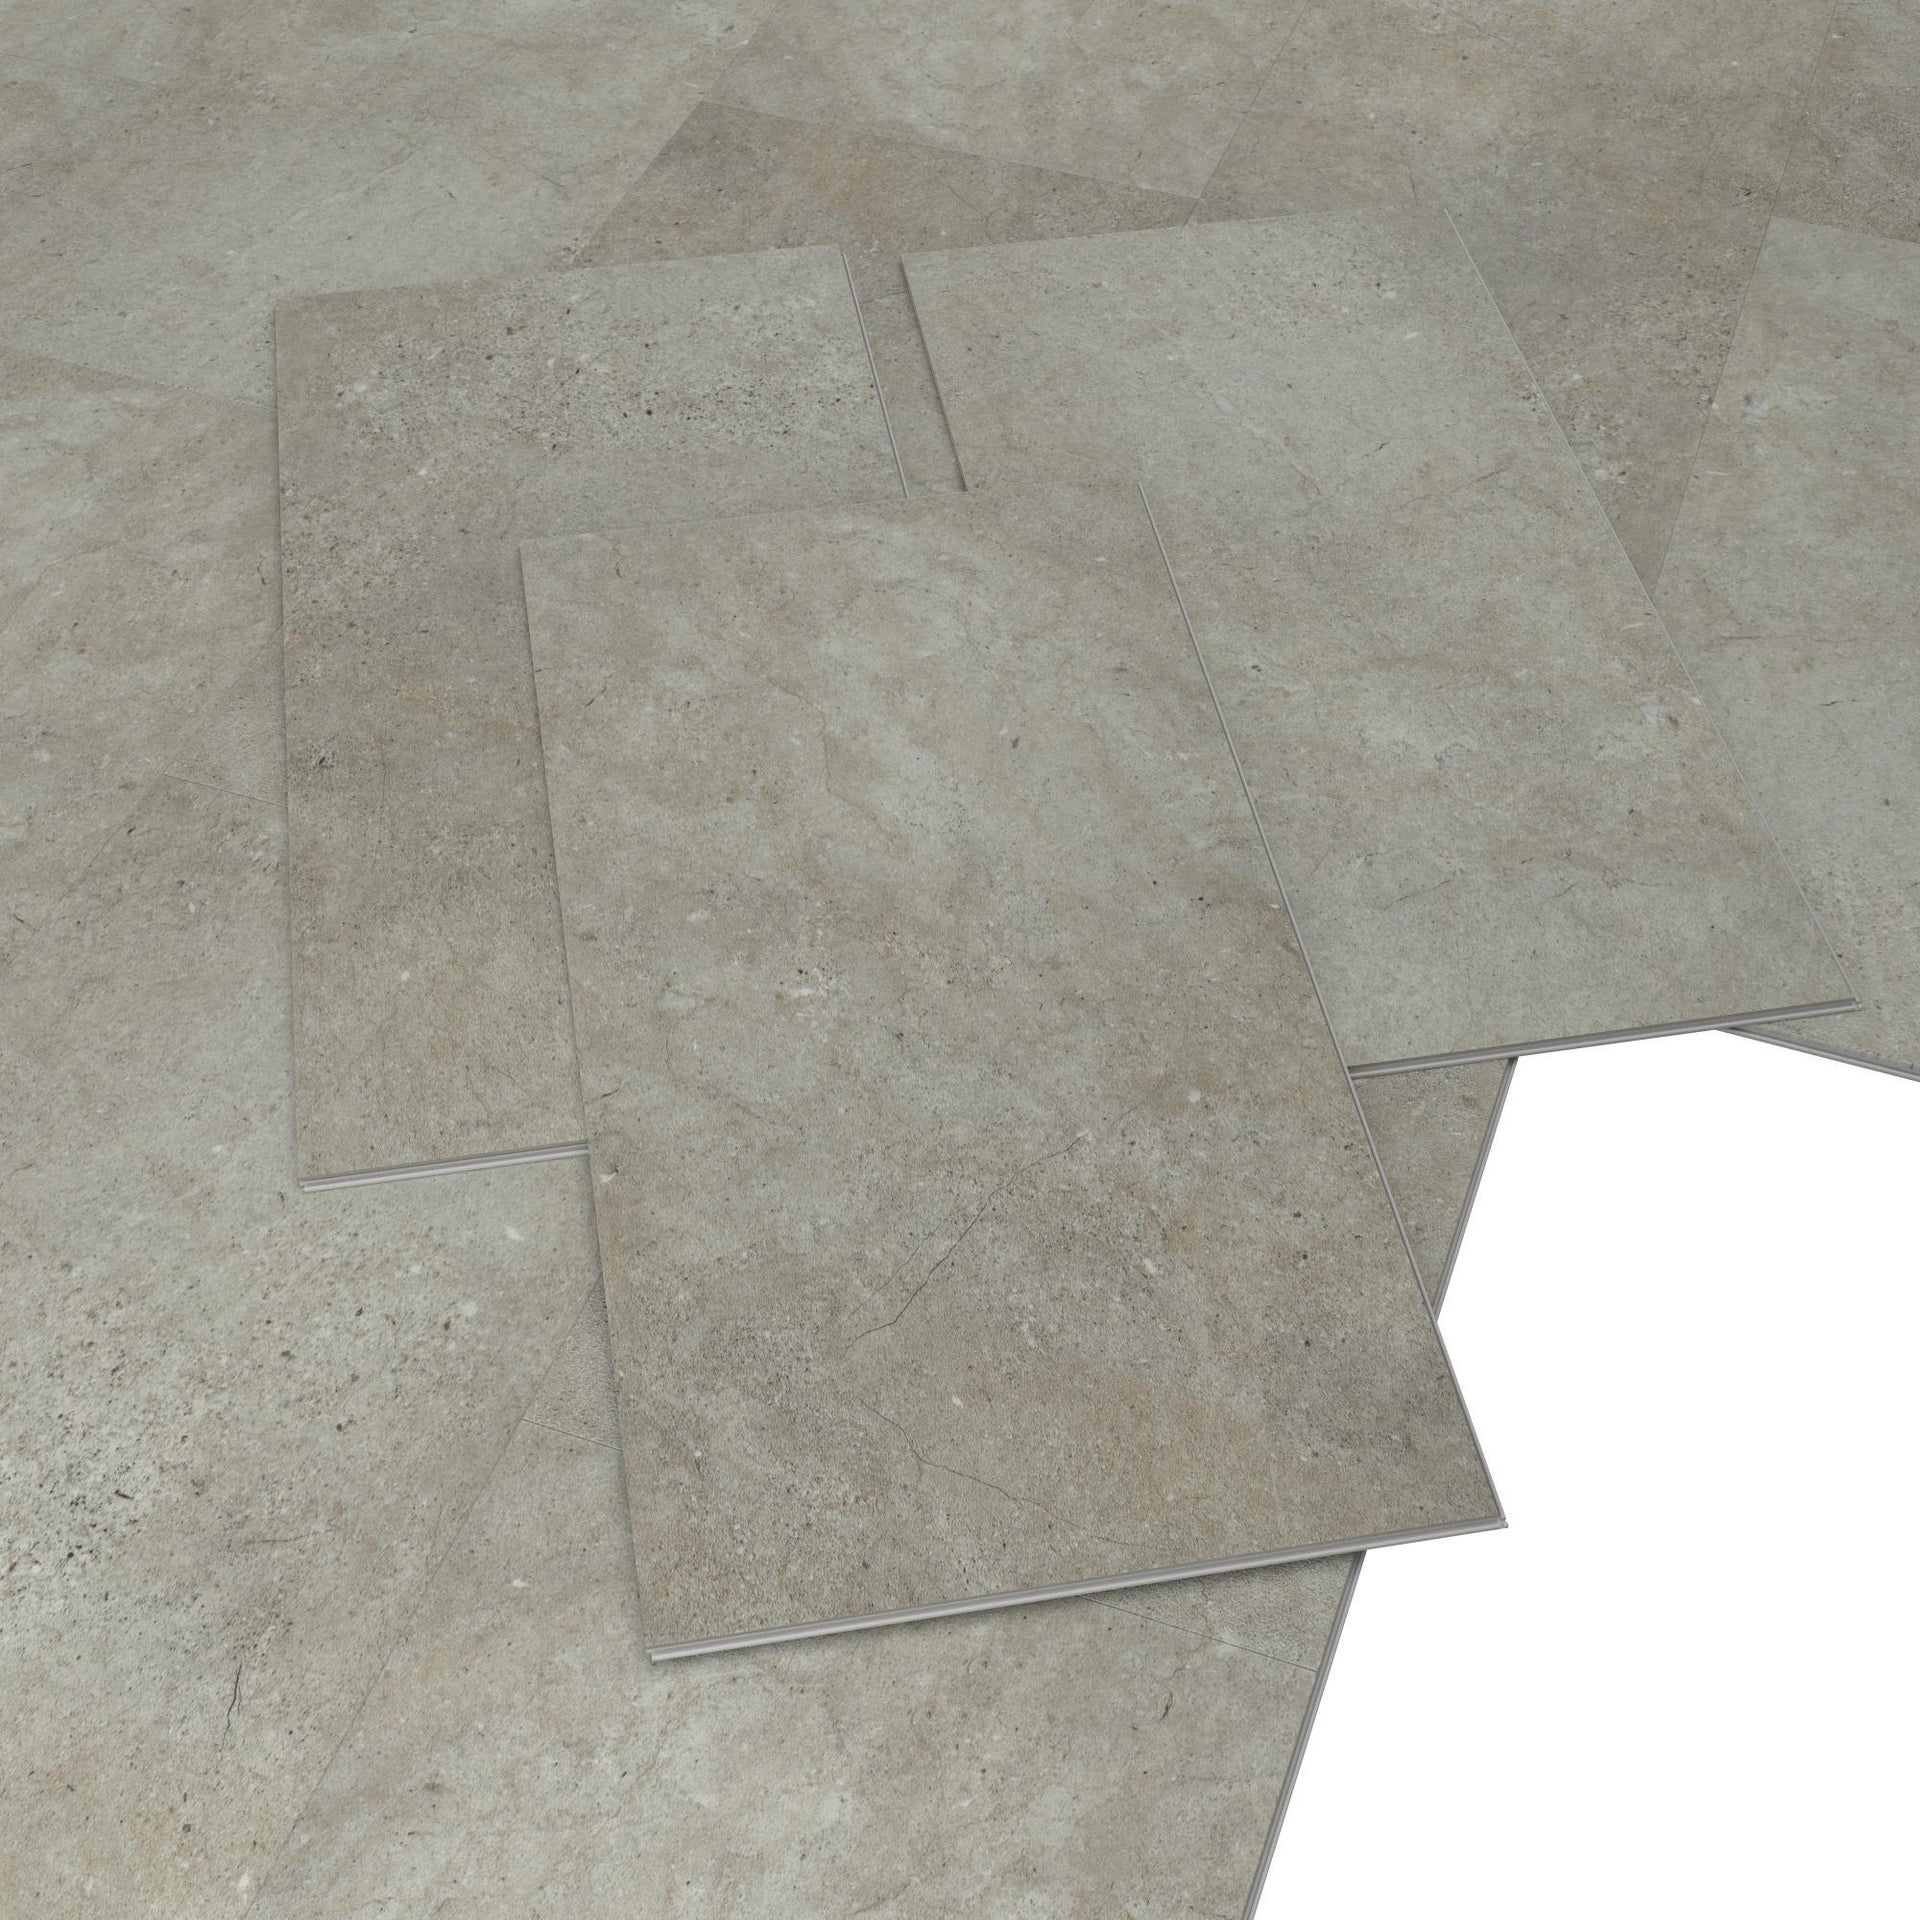 Pavimento PVC flottante clic+ Jaraoso Sp 4.2 mm beige - 4